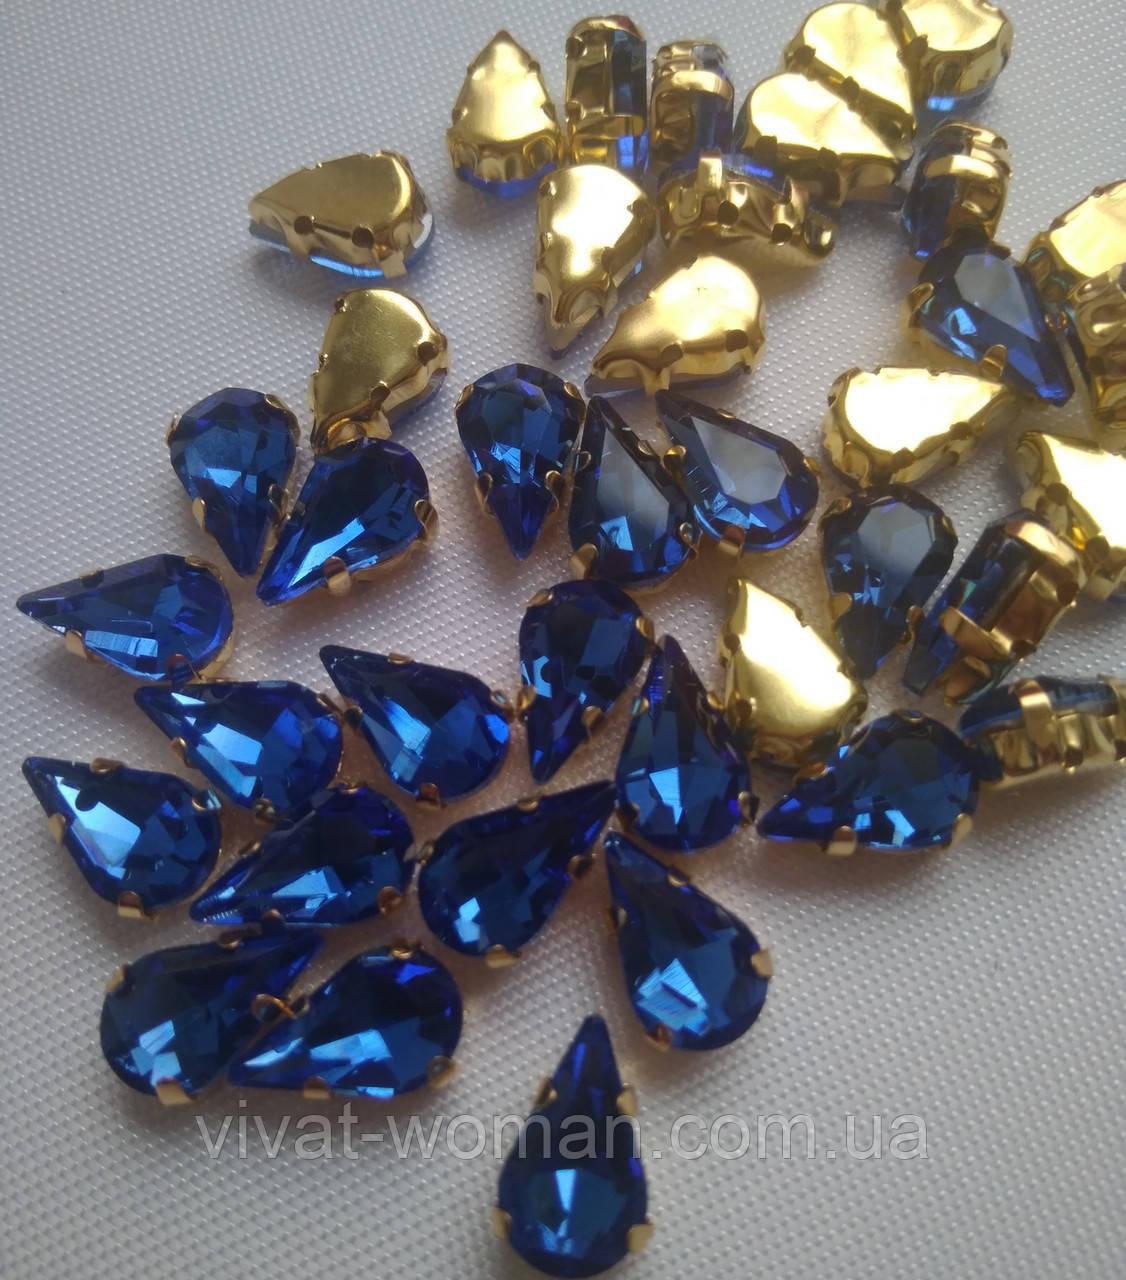 Пришивные стразы в цапах, Капля 6х10 мм, Sapphire, стекло, золотые цапы. Цена за 1 шт